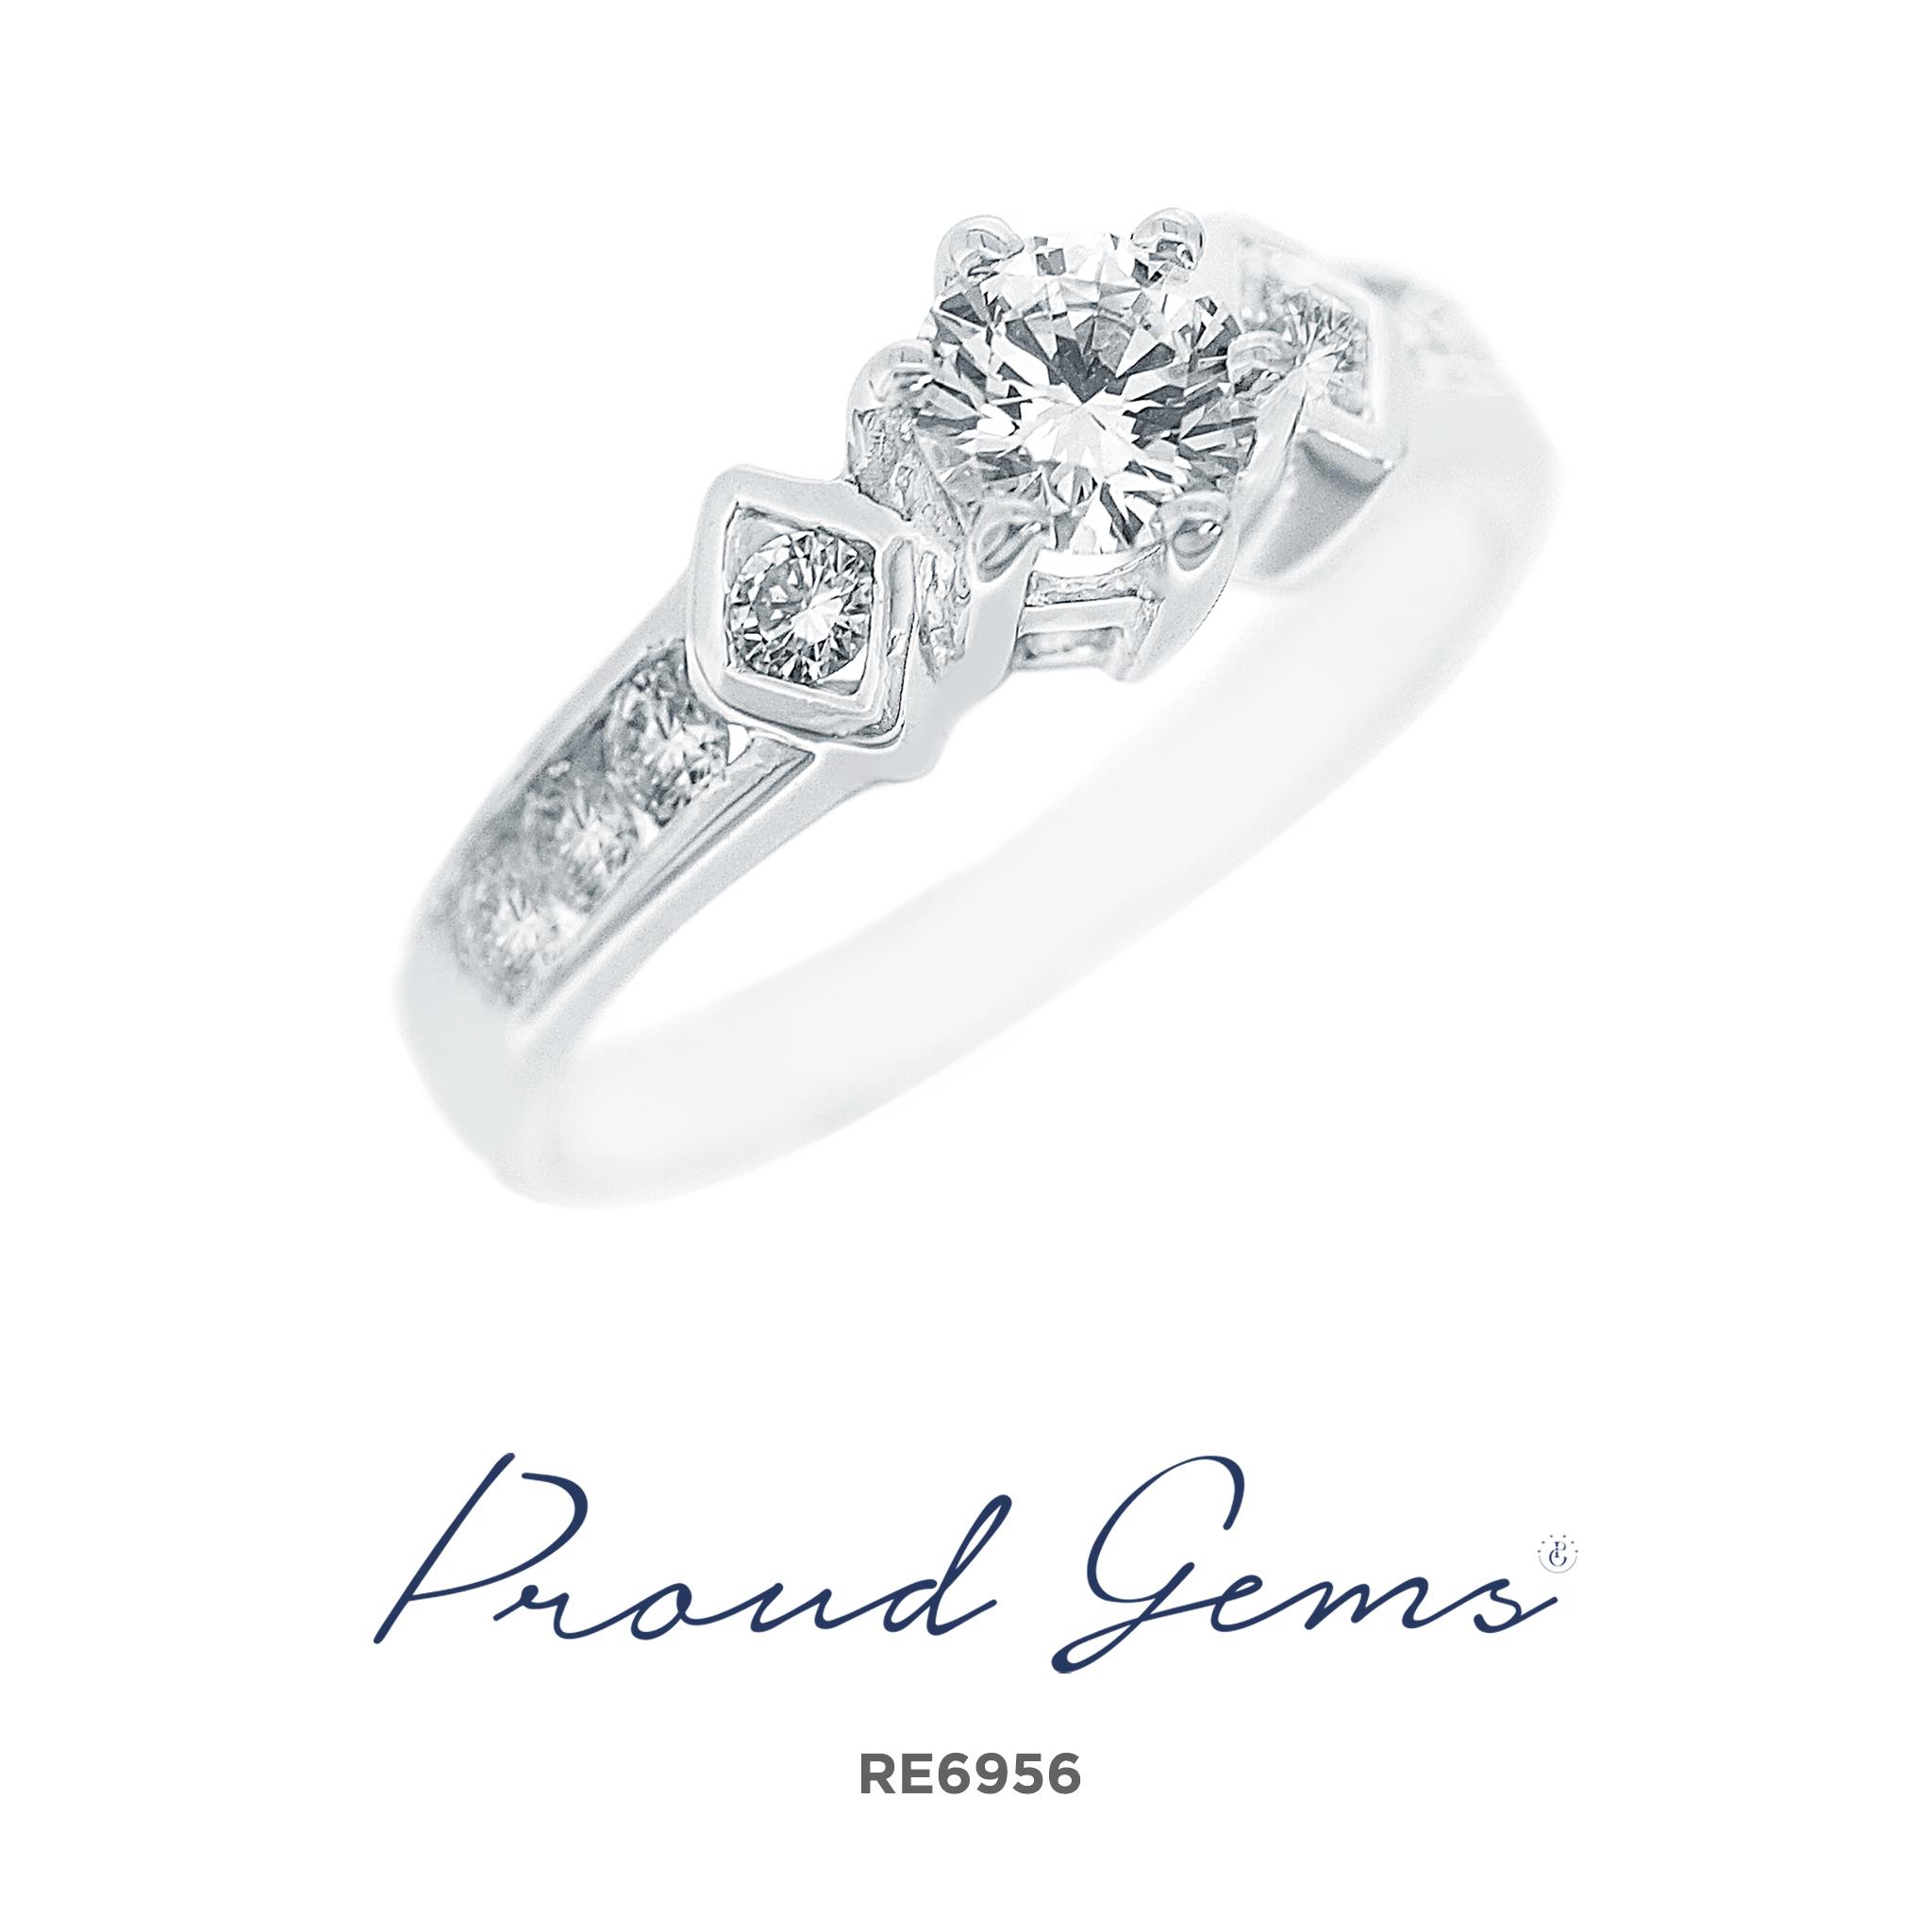 6956RE1 1 - แหวนหมั้นเพชร RE6956